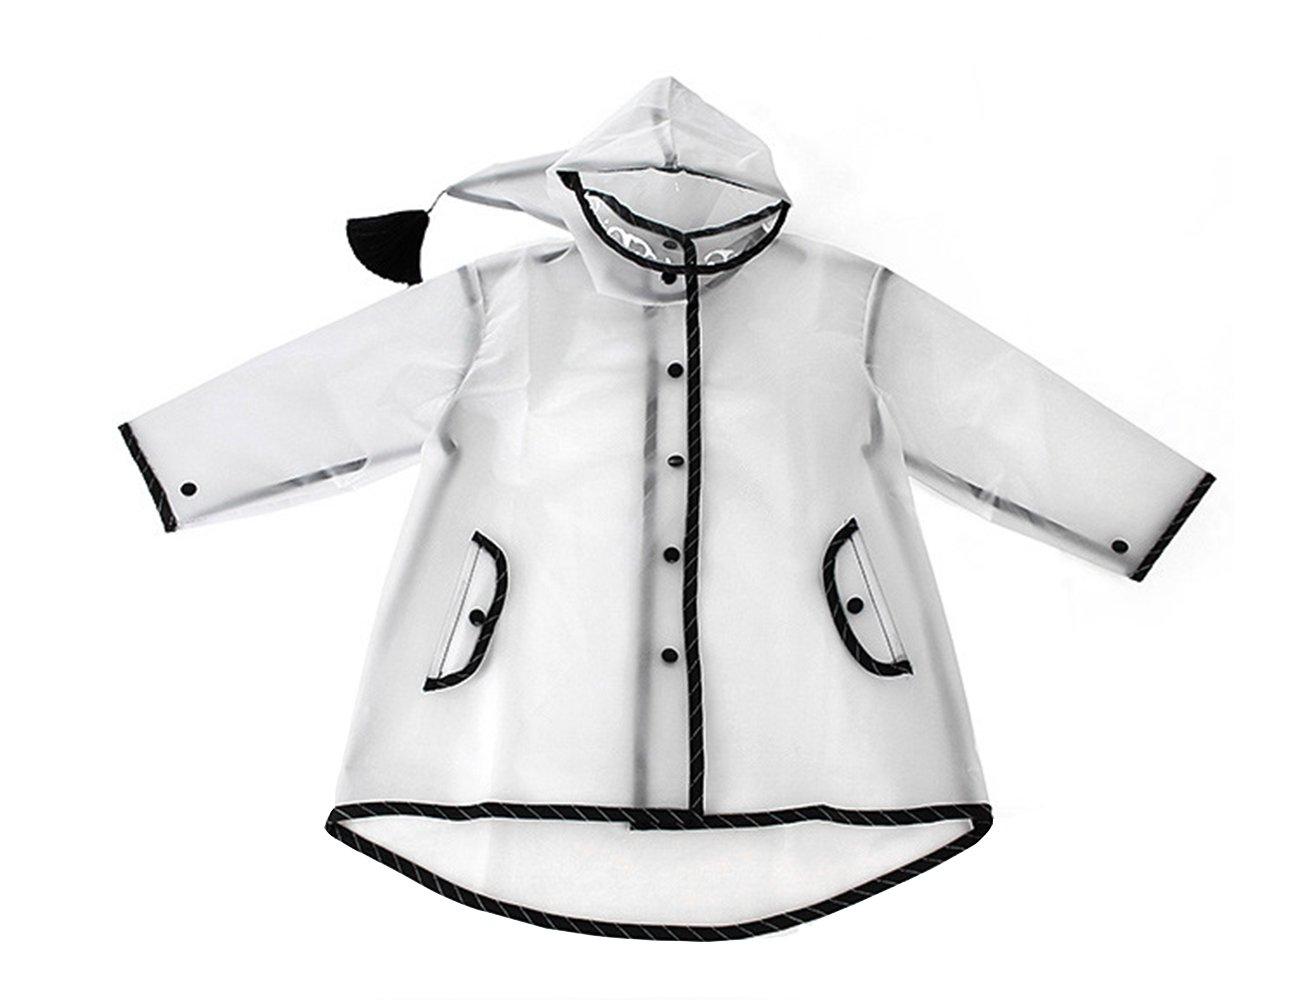 ITSMN Kids Waterproof Hooded Rain Jacket Raincoat Lightweight Poncho Outdoor Clear Black 2XL (Age 11-15 Y)